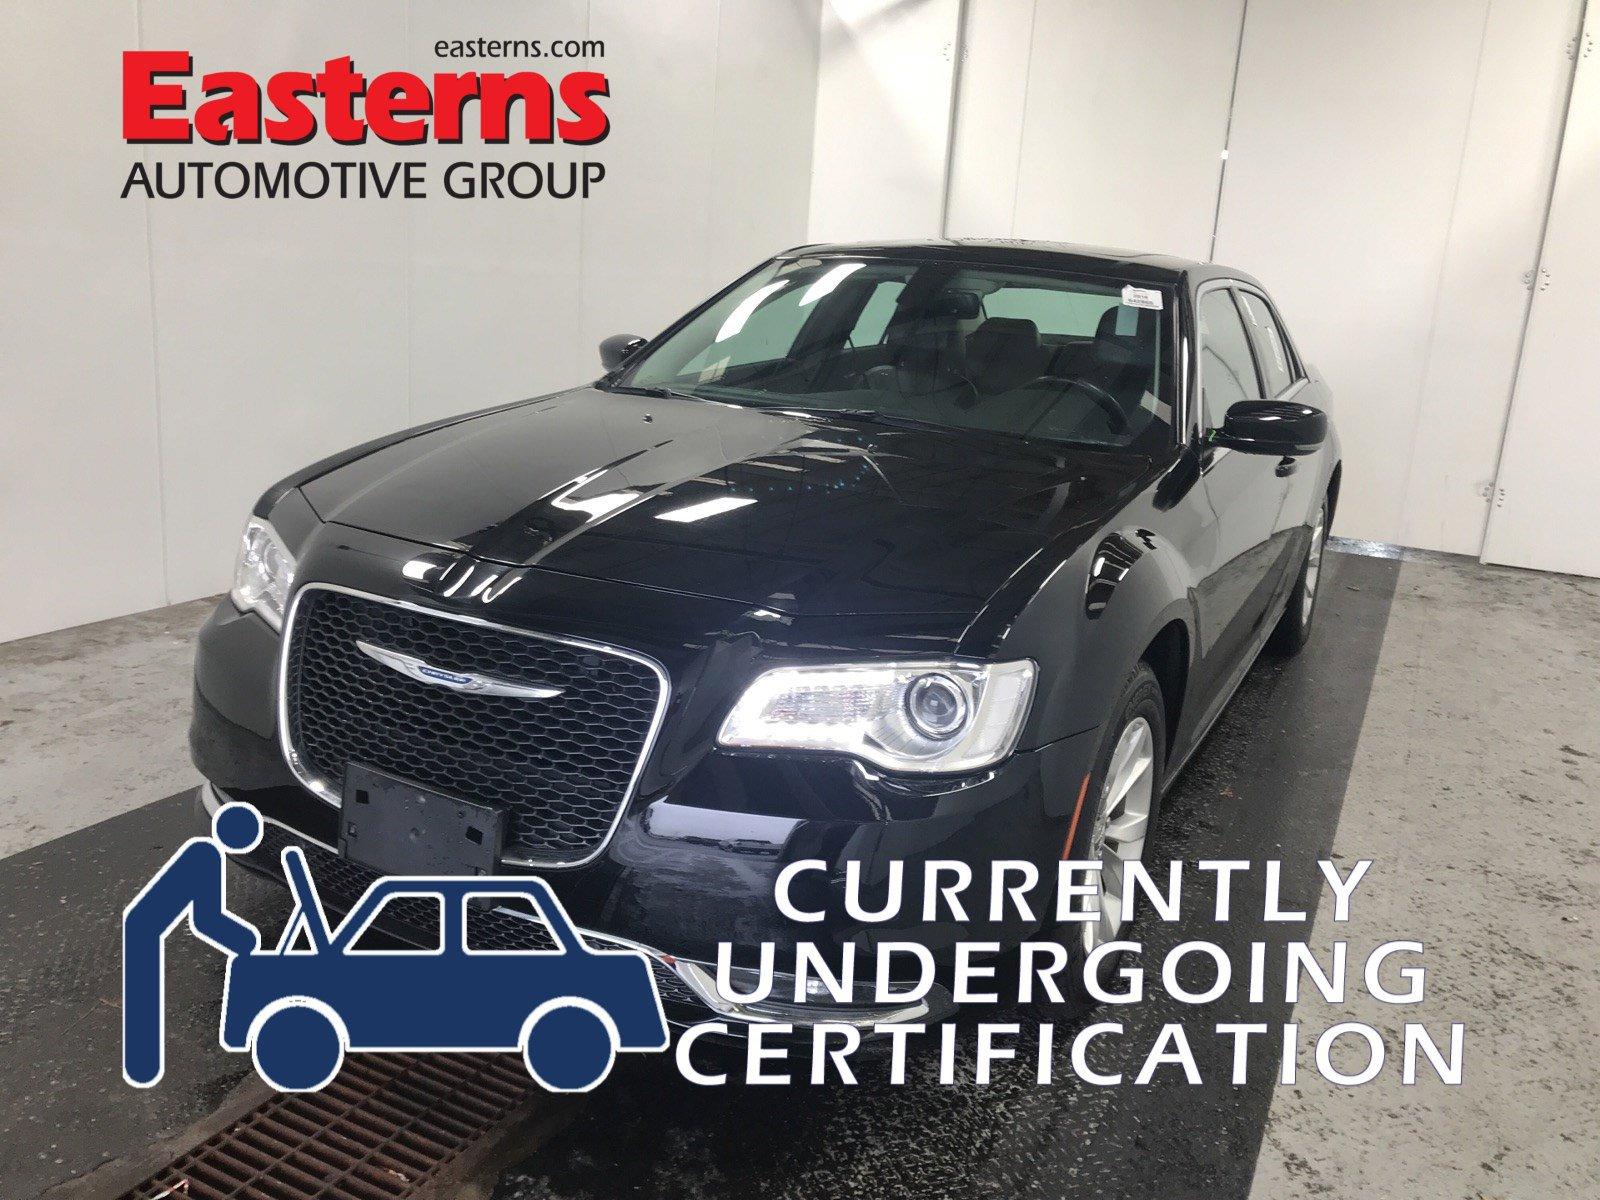 2016 Chrysler 300 Limited w/ 300 Premium Group image